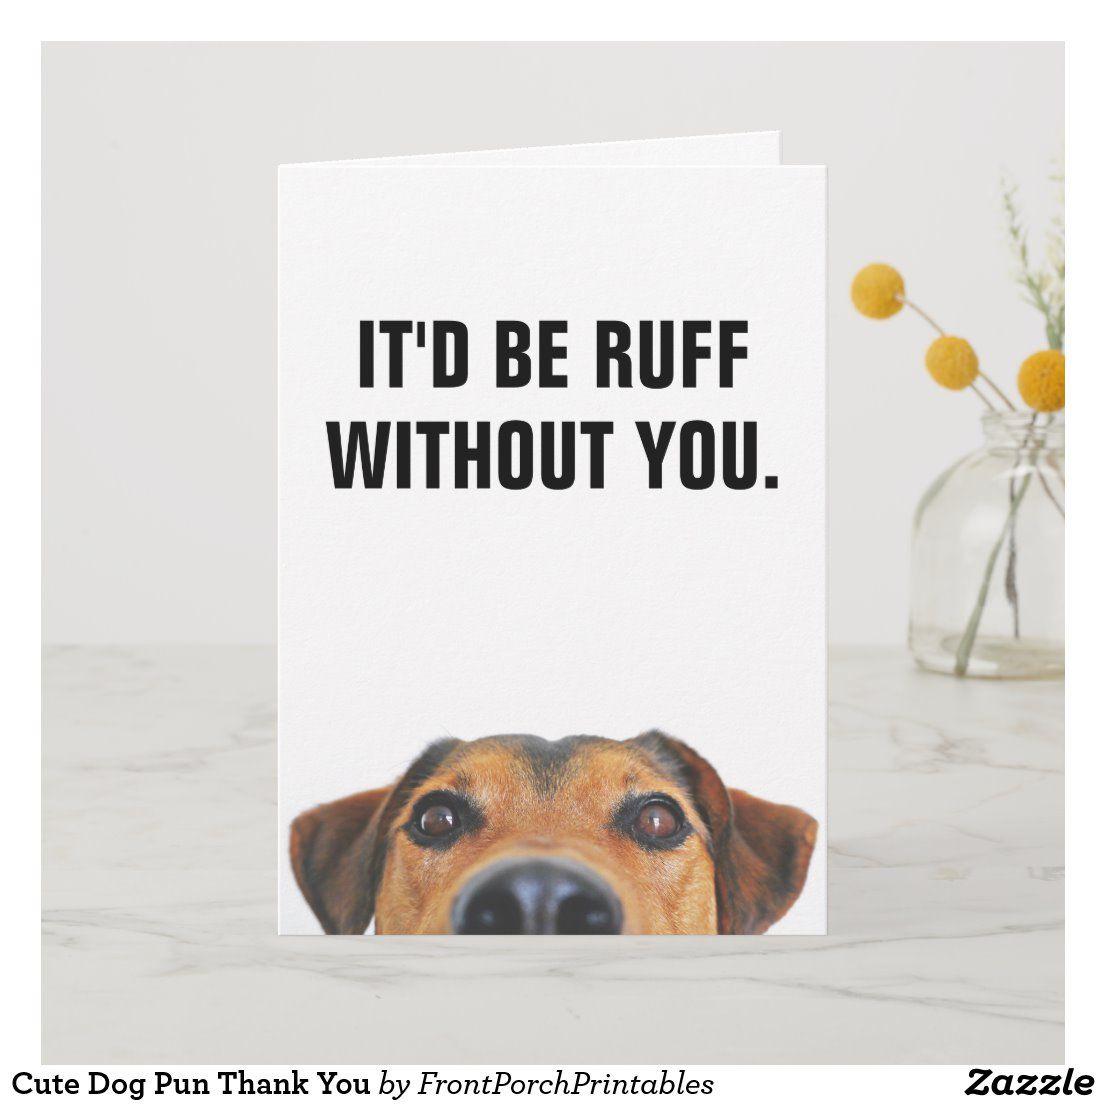 Cute dog pun thank you in 2020 dog puns